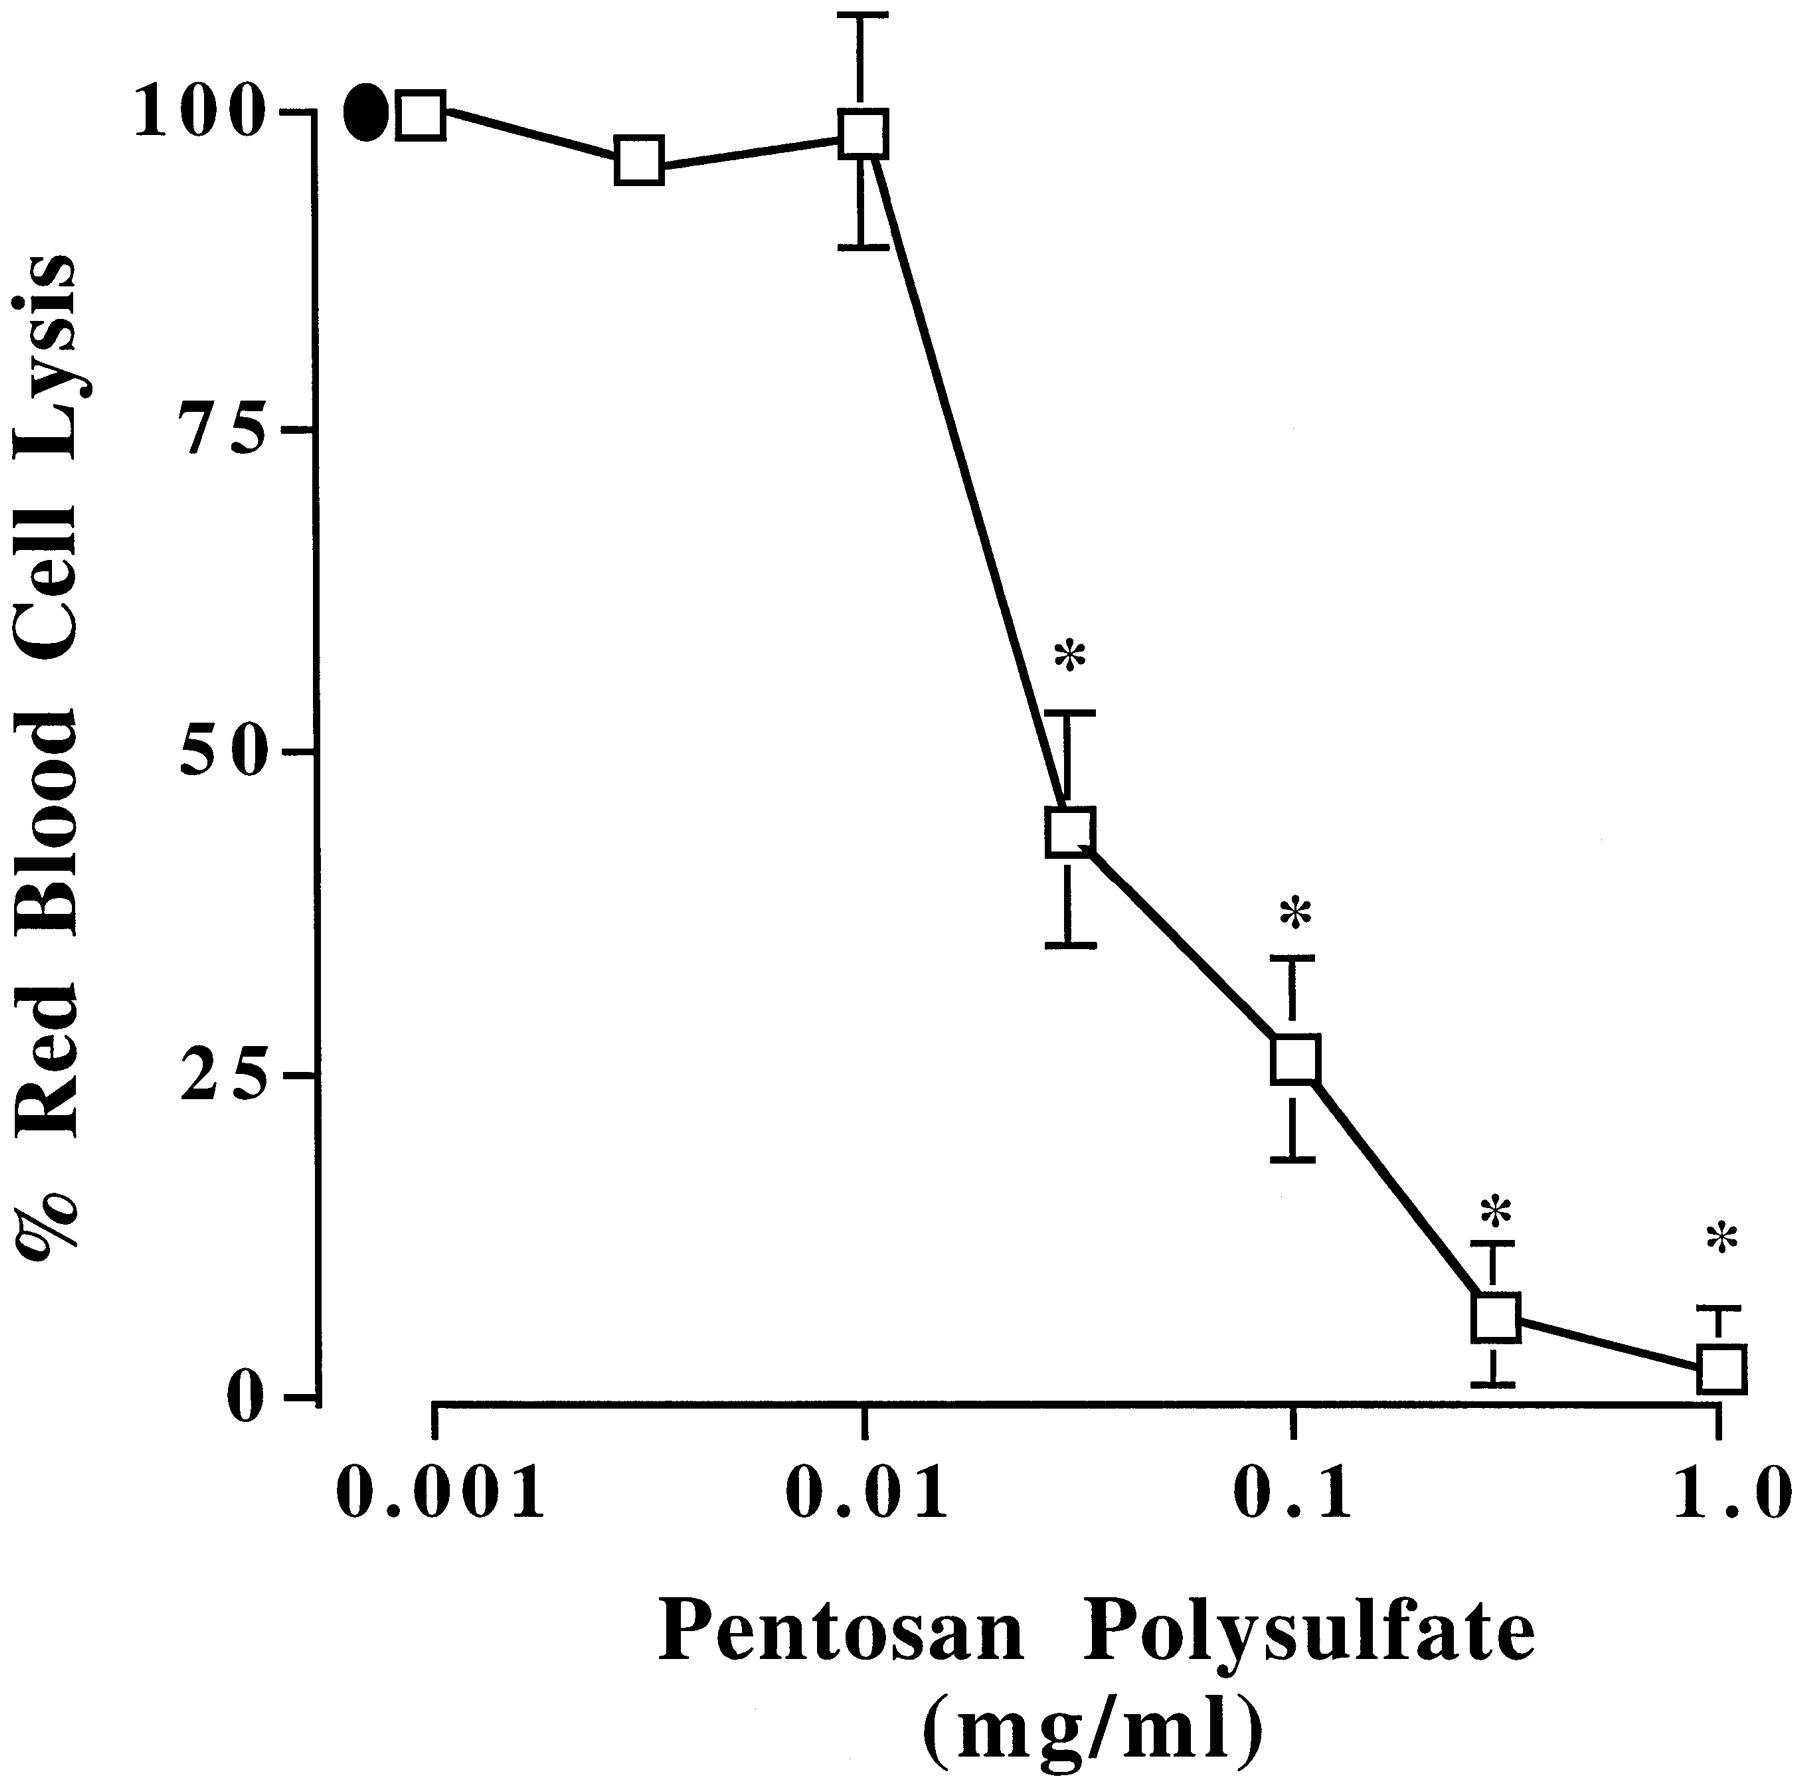 The Semisynthetic Polysaccharide Pentosan Polysulfate